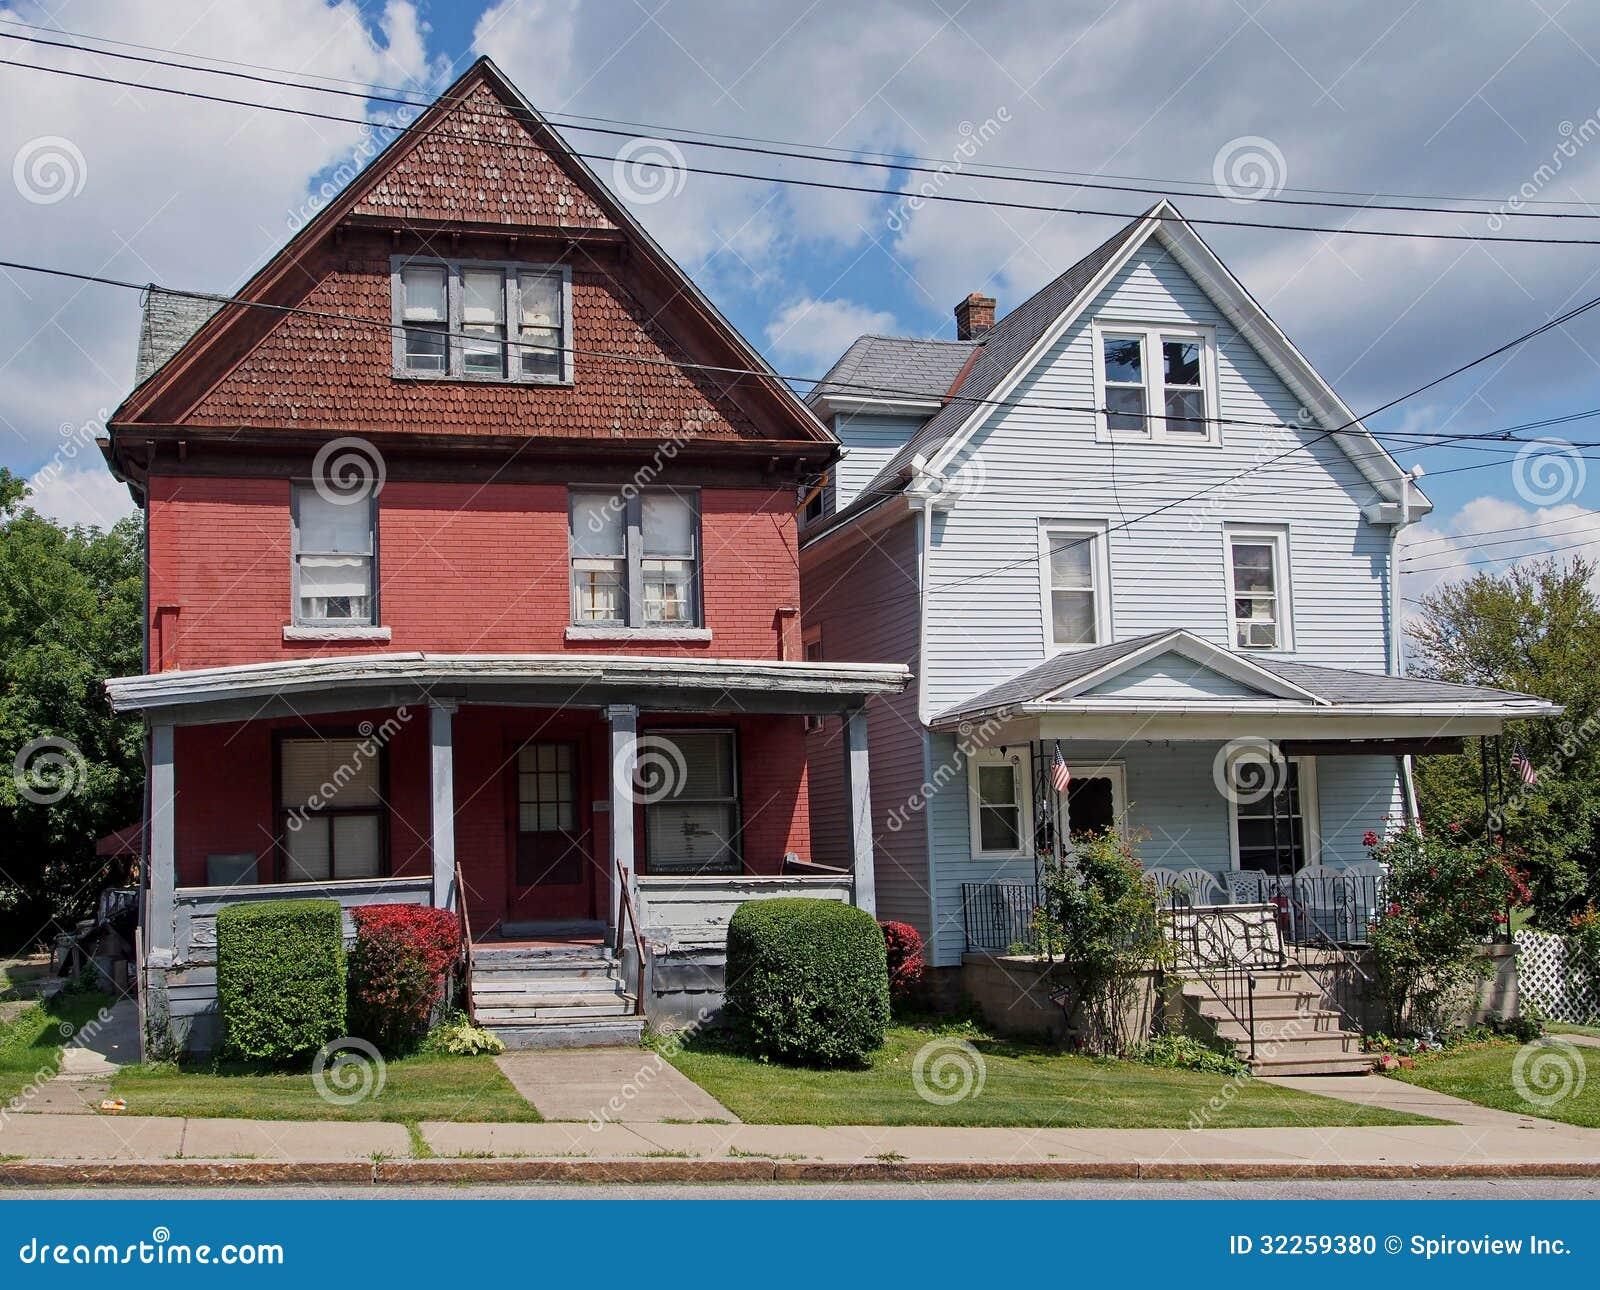 oude amerikaanse huizen stock foto afbeelding bestaande uit werf 32259380. Black Bedroom Furniture Sets. Home Design Ideas